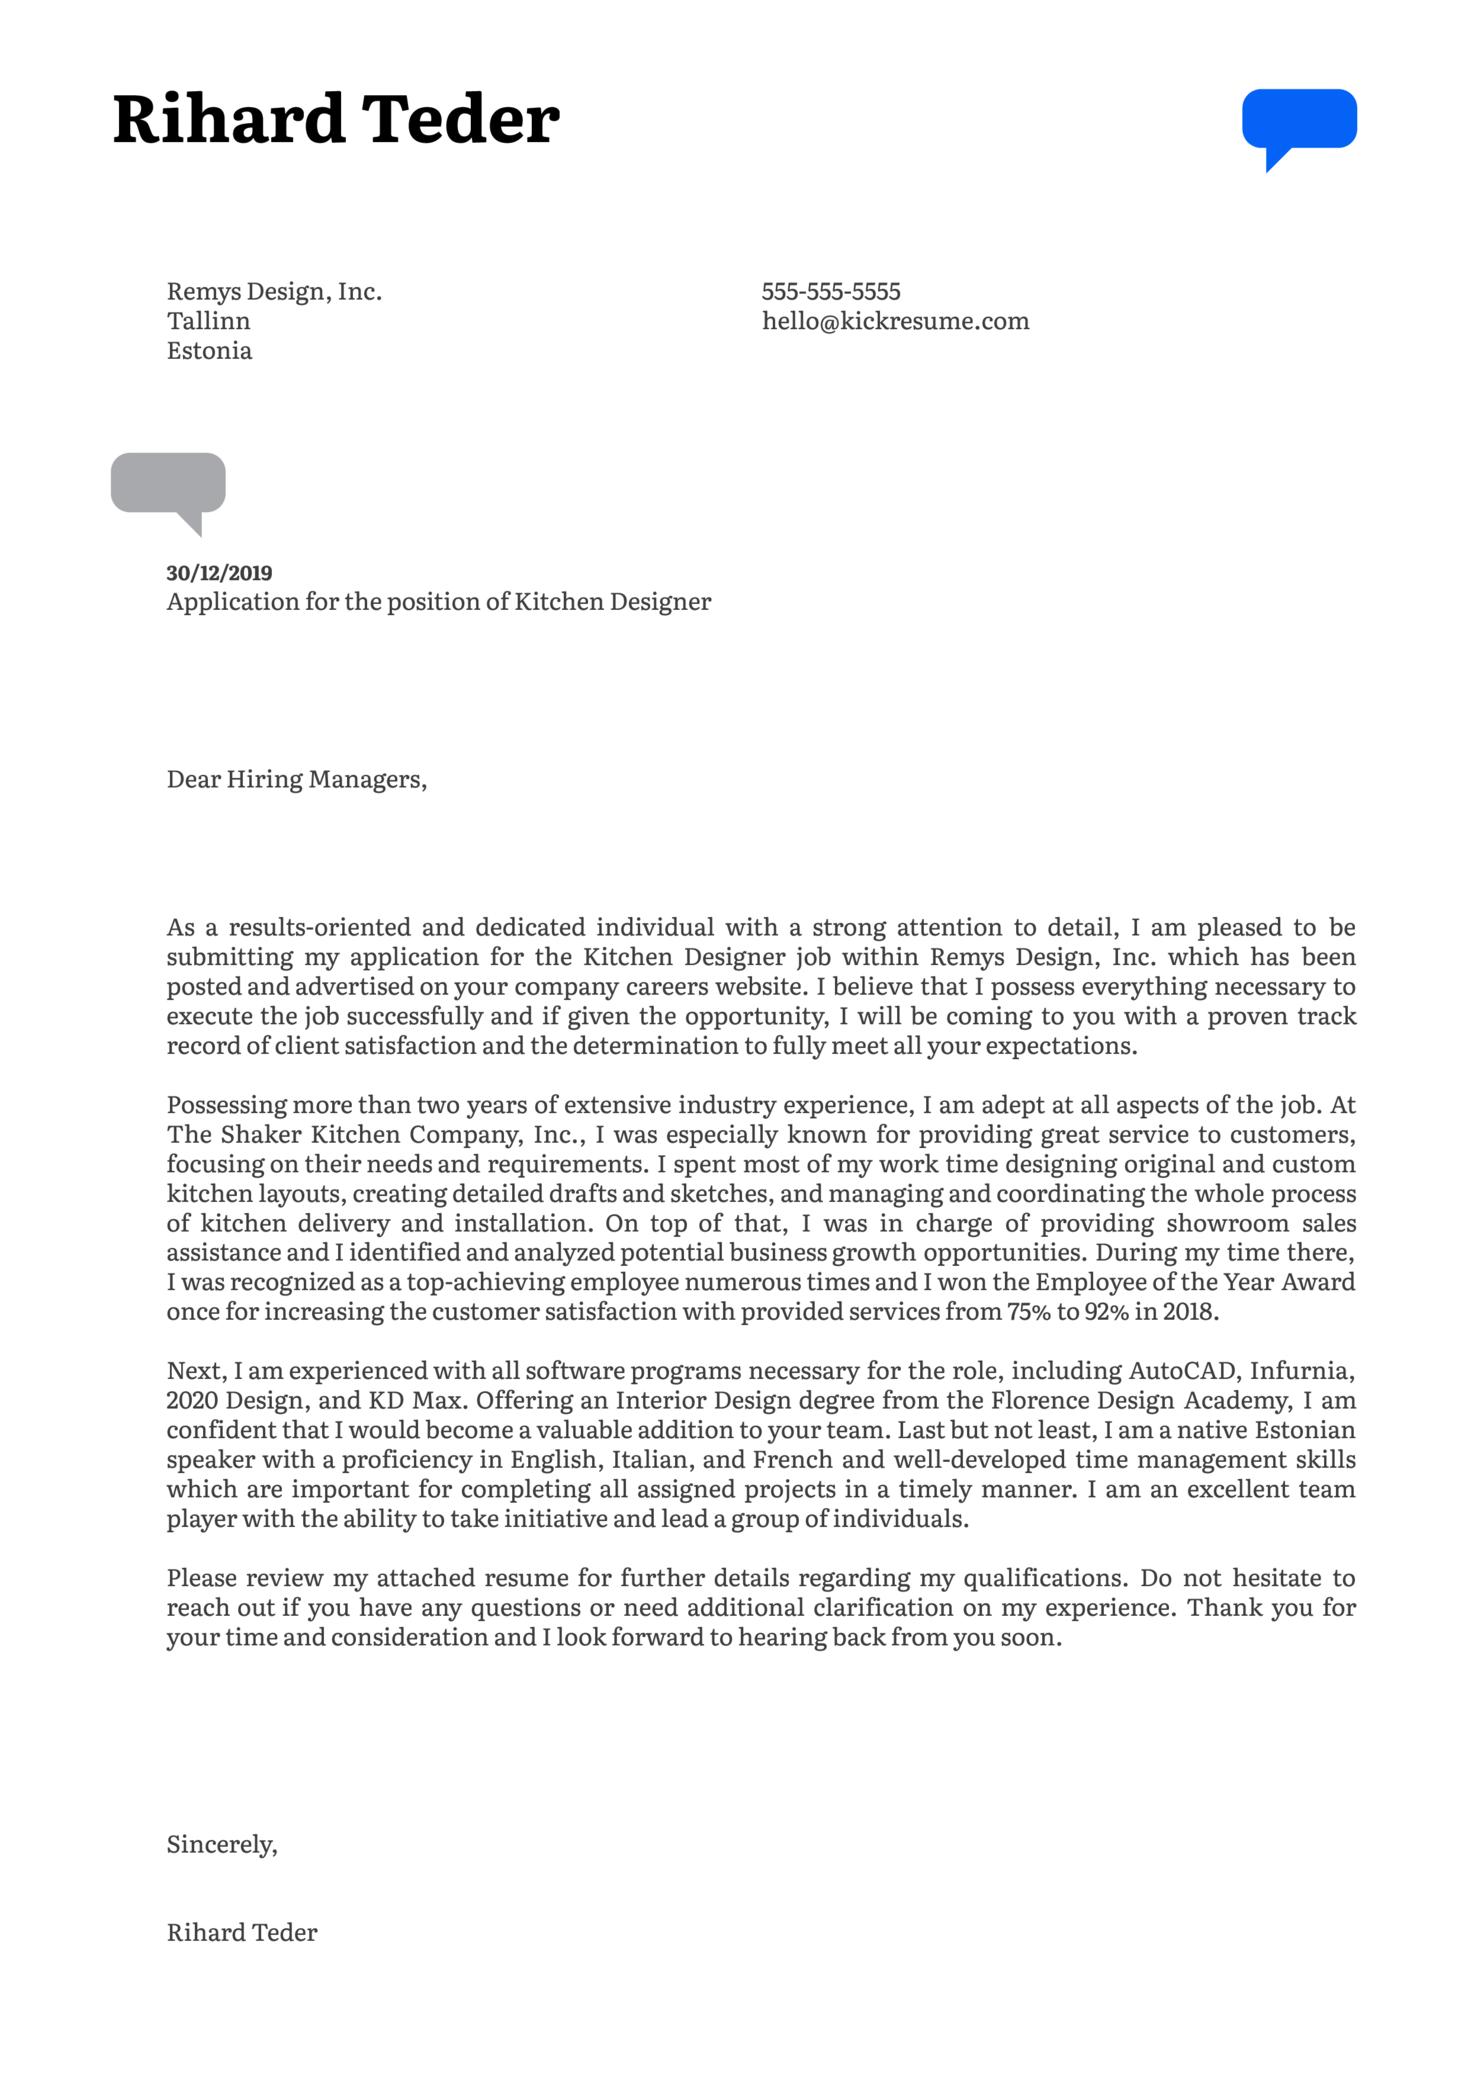 Kitchen Designer Cover Letter Sample